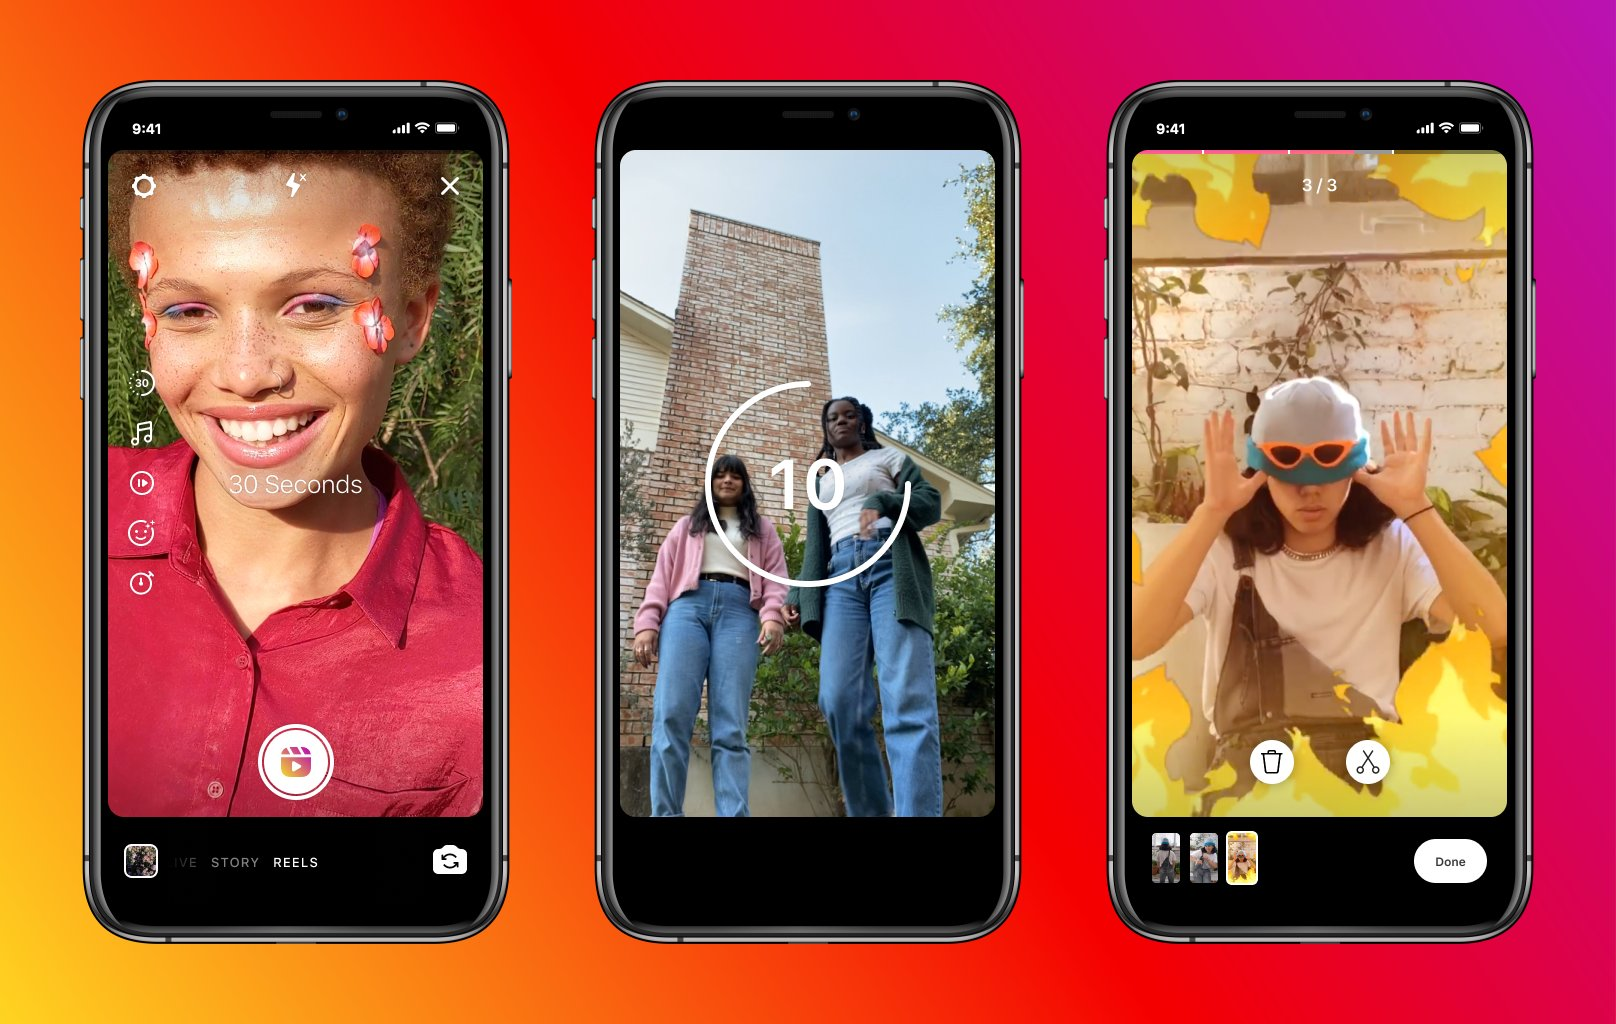 Instagram migliora Reels, il suo TikTok integrato